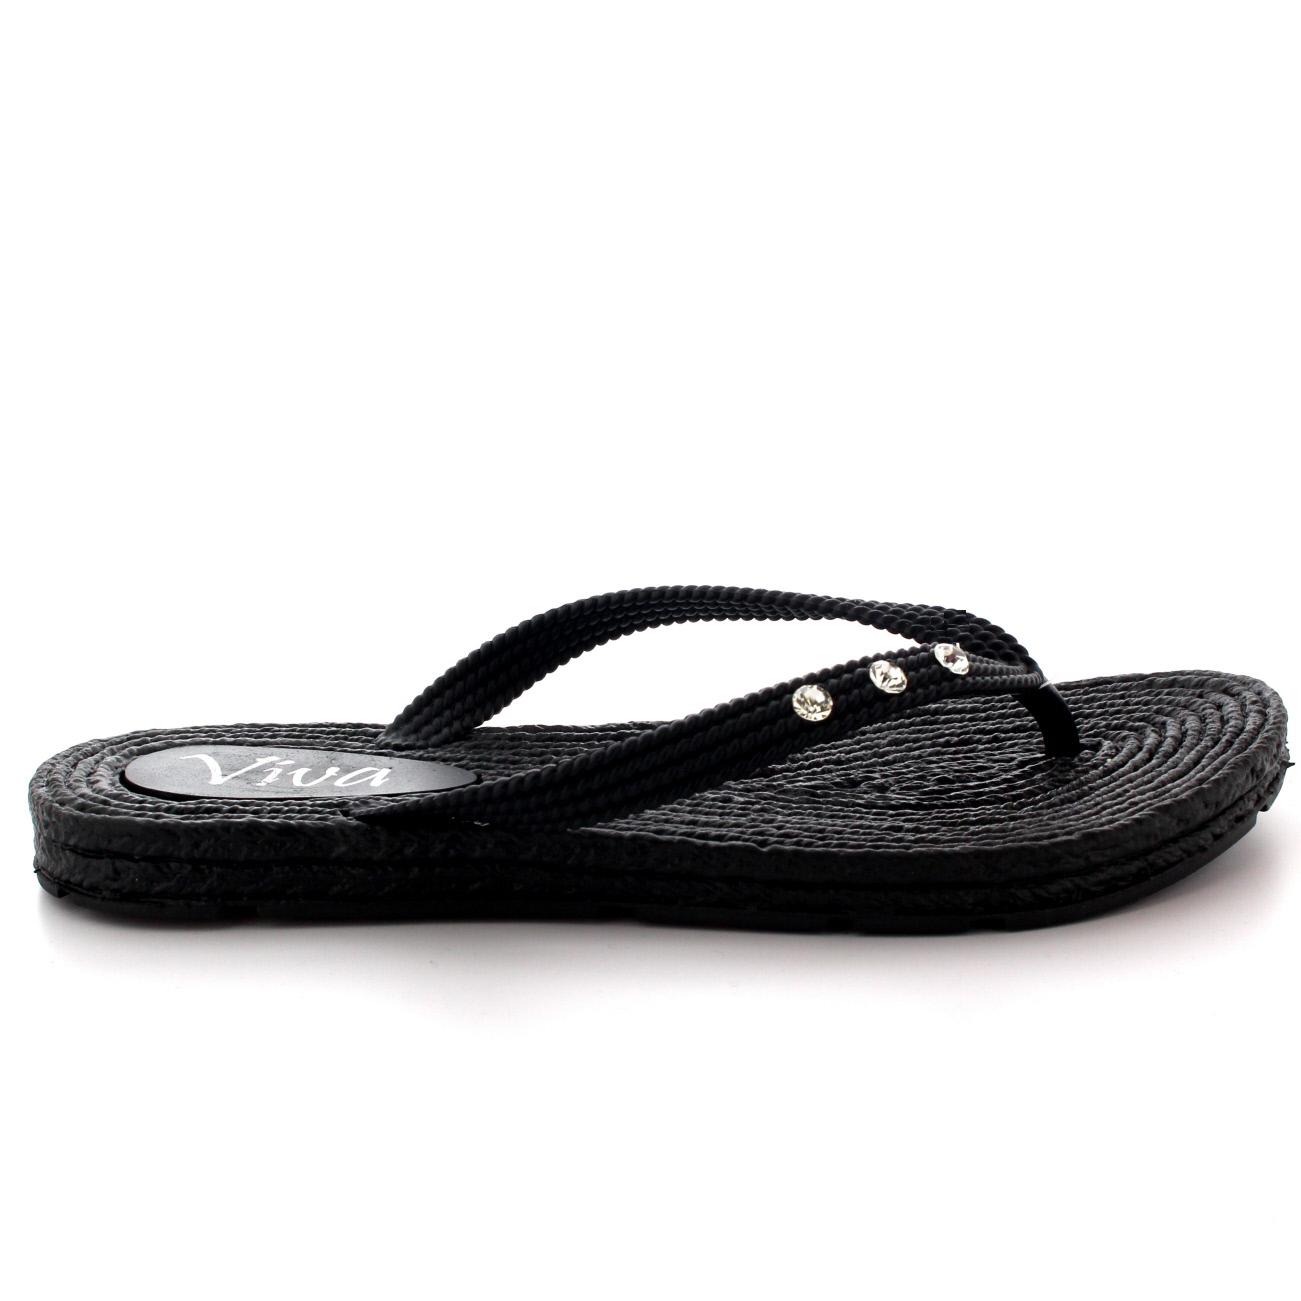 Womens sandals uk - Womens Sandals Beach Toe Post Summer Wedge Heel